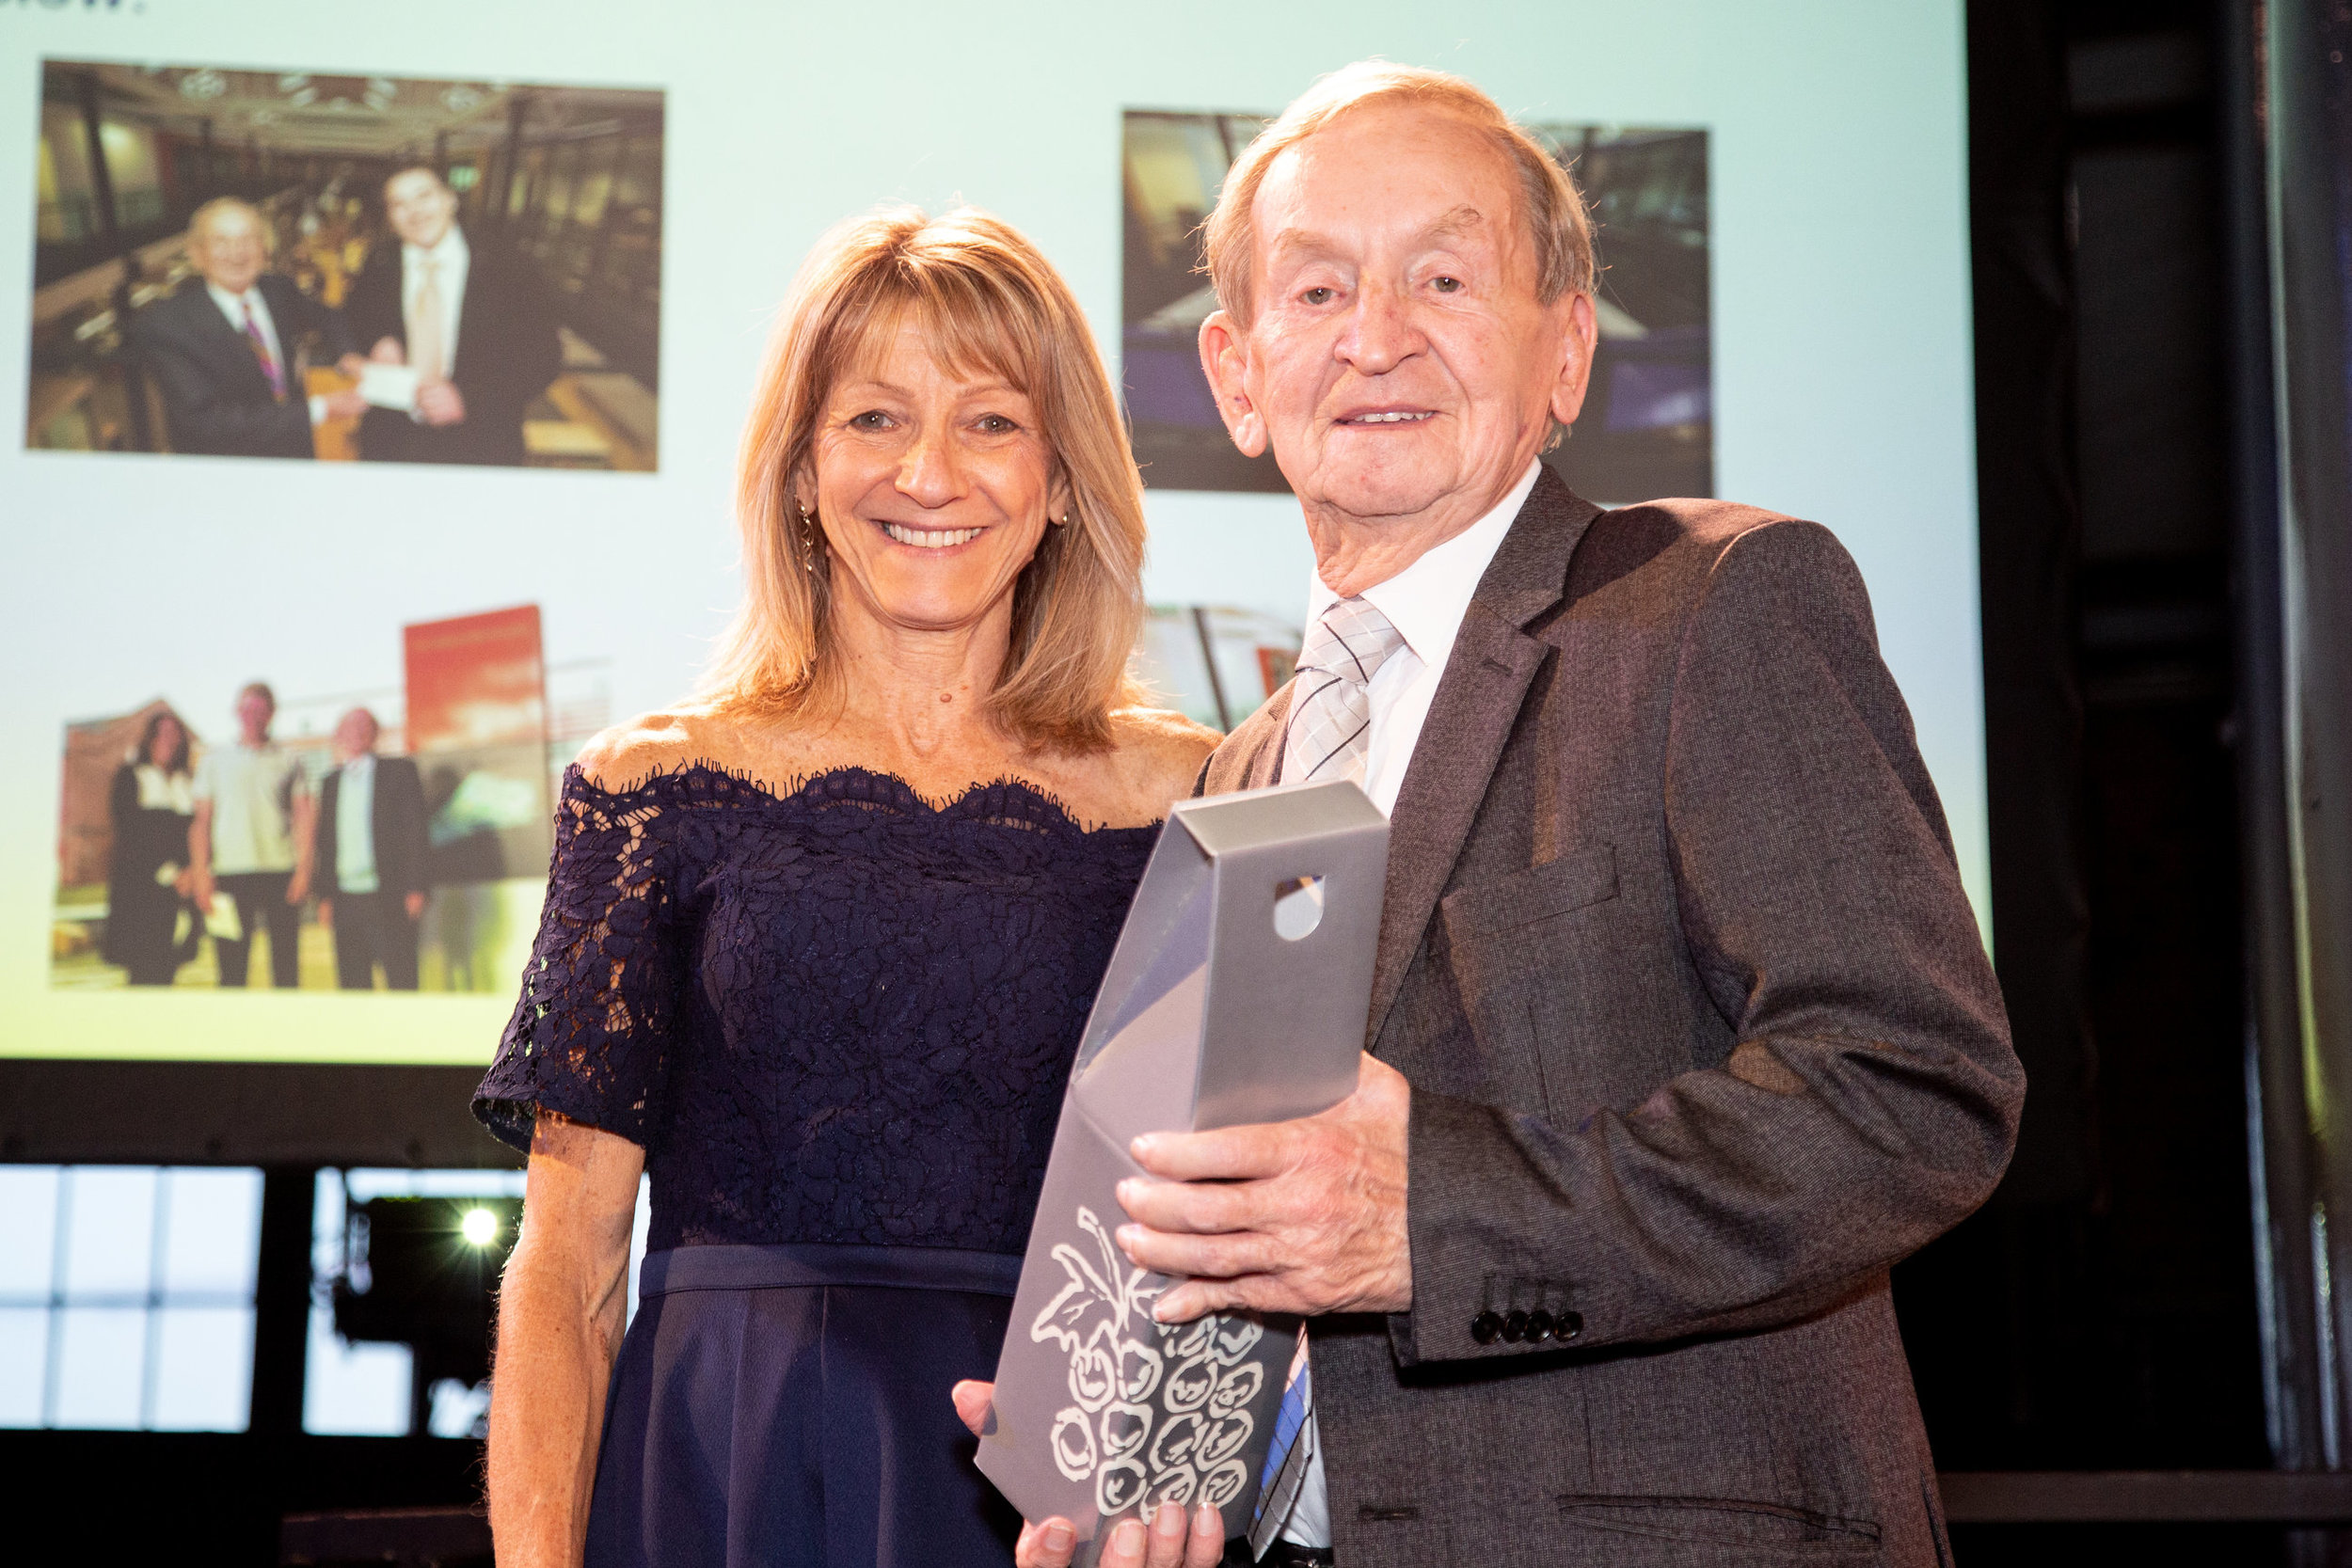 Picture: Alex Cantrill-Jones / ACJ MediaDerby College Peak Awards 2018.